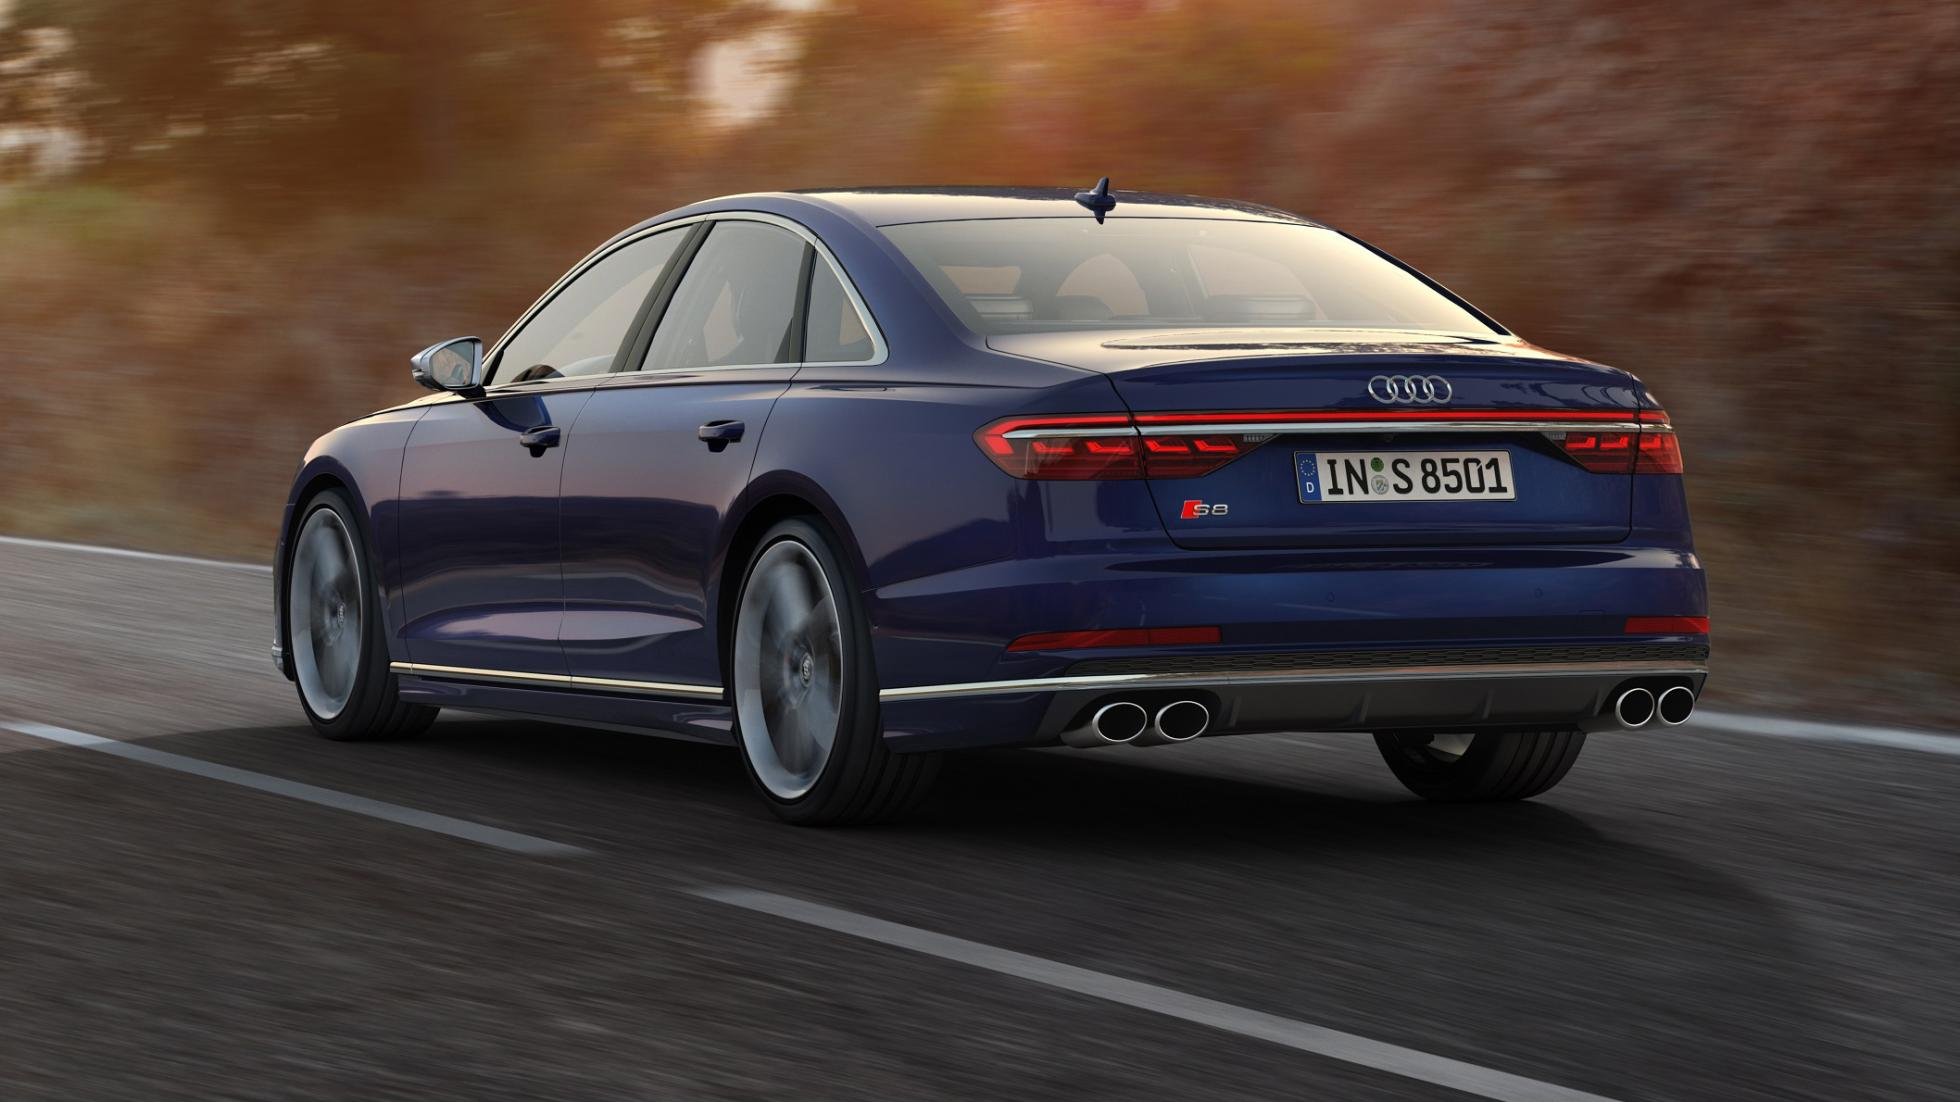 L'Audi S8 ne passe PAS au diesel - Galerie